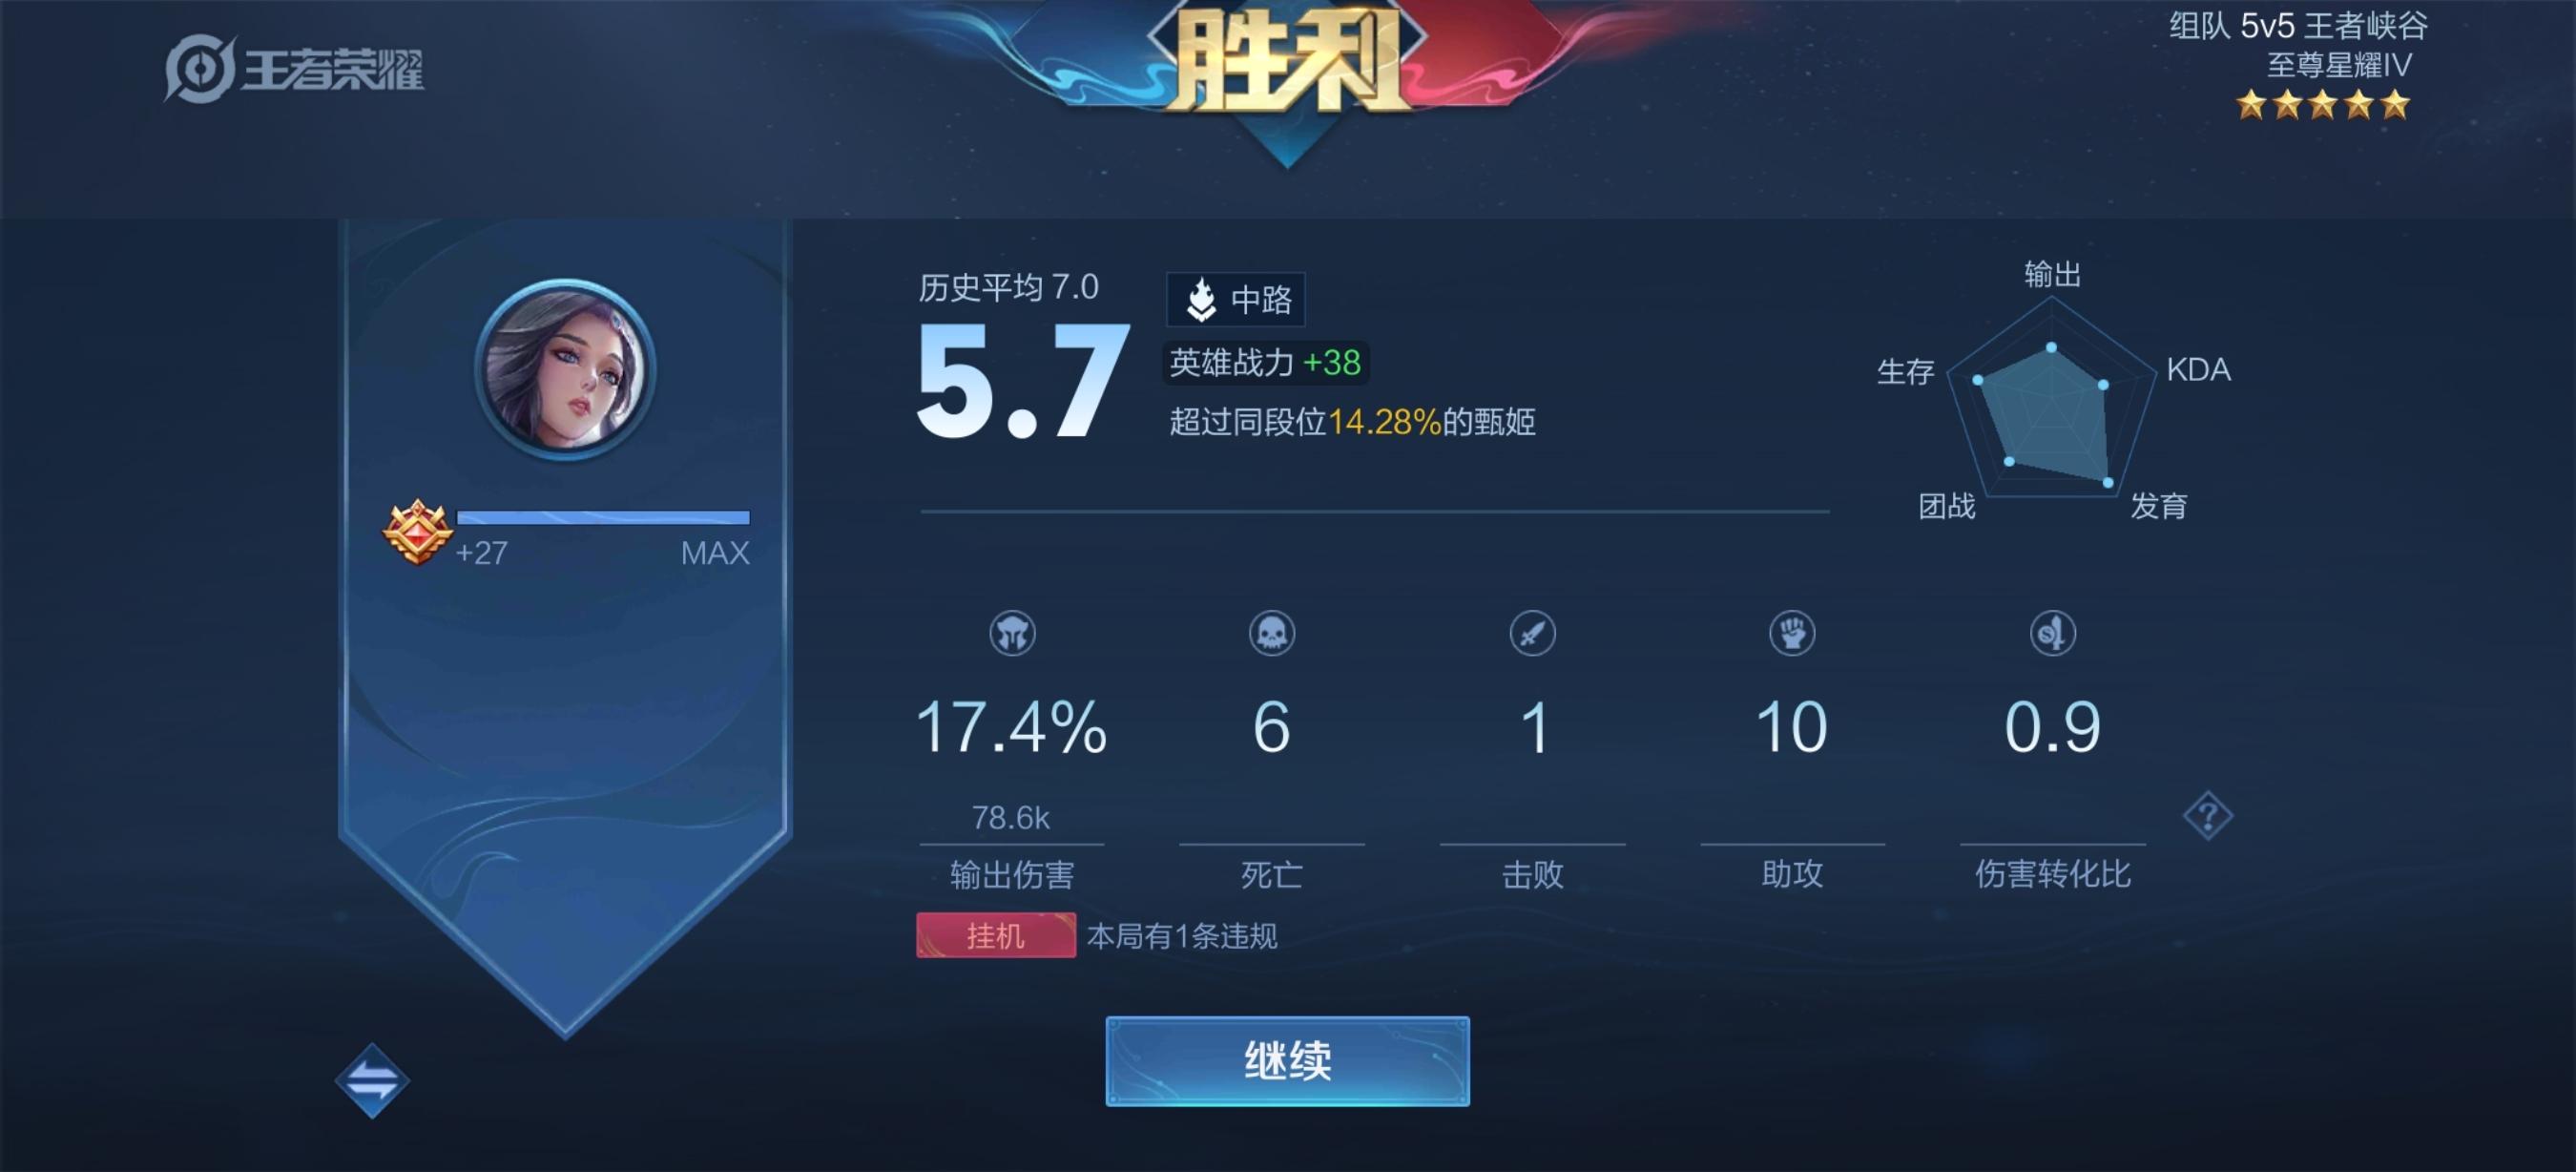 Screenshot_20210916_001432_com.tencent.tmgp.sgame.jpg